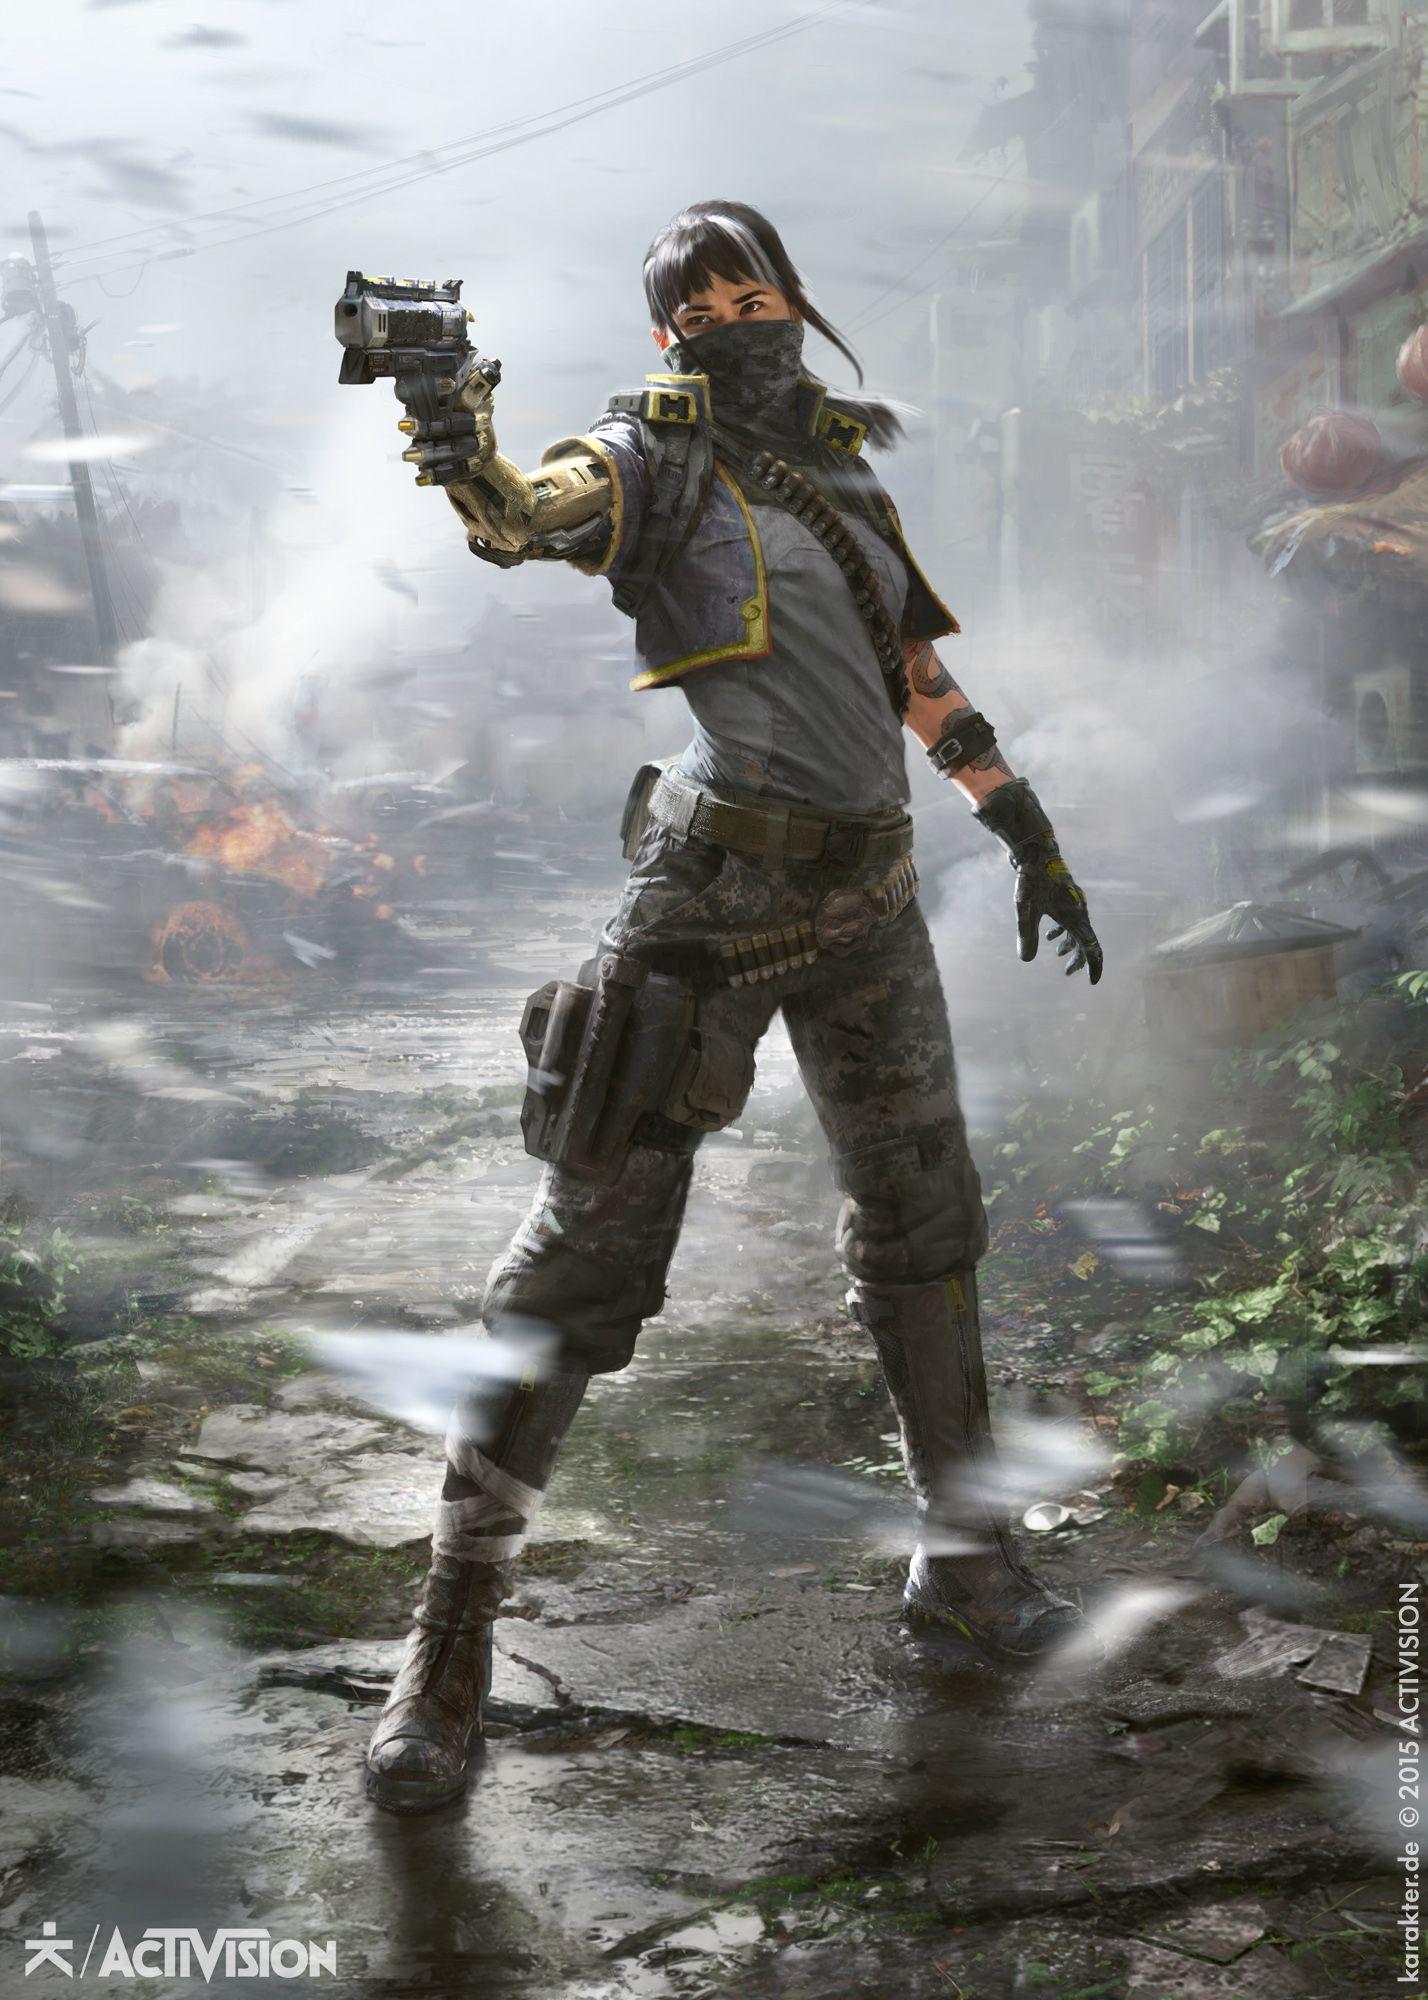 Call Of Duty Black Ops Iii Marketing Art By Karakter Design Studio Concept Art World Call Of Duty Black Ops 3